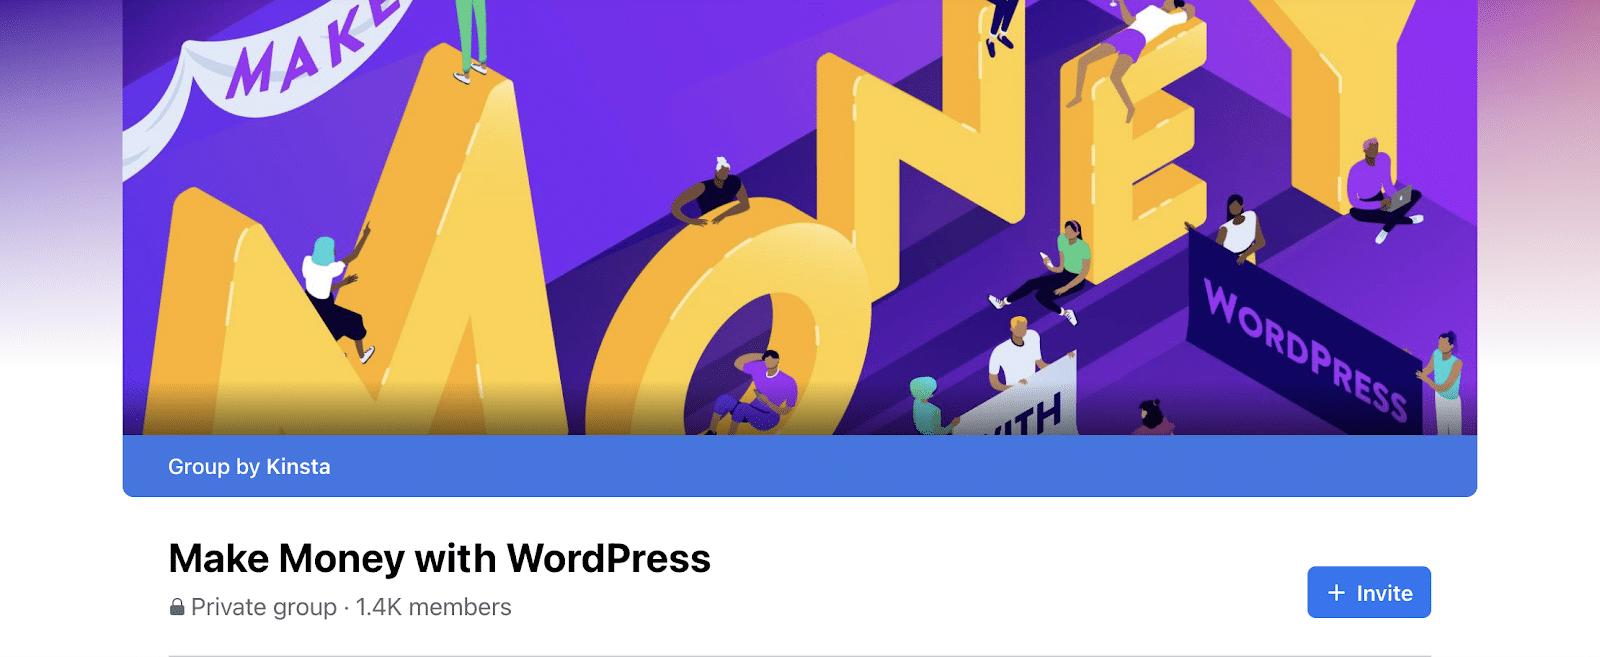 Make Money with WordPress Facebook Groups